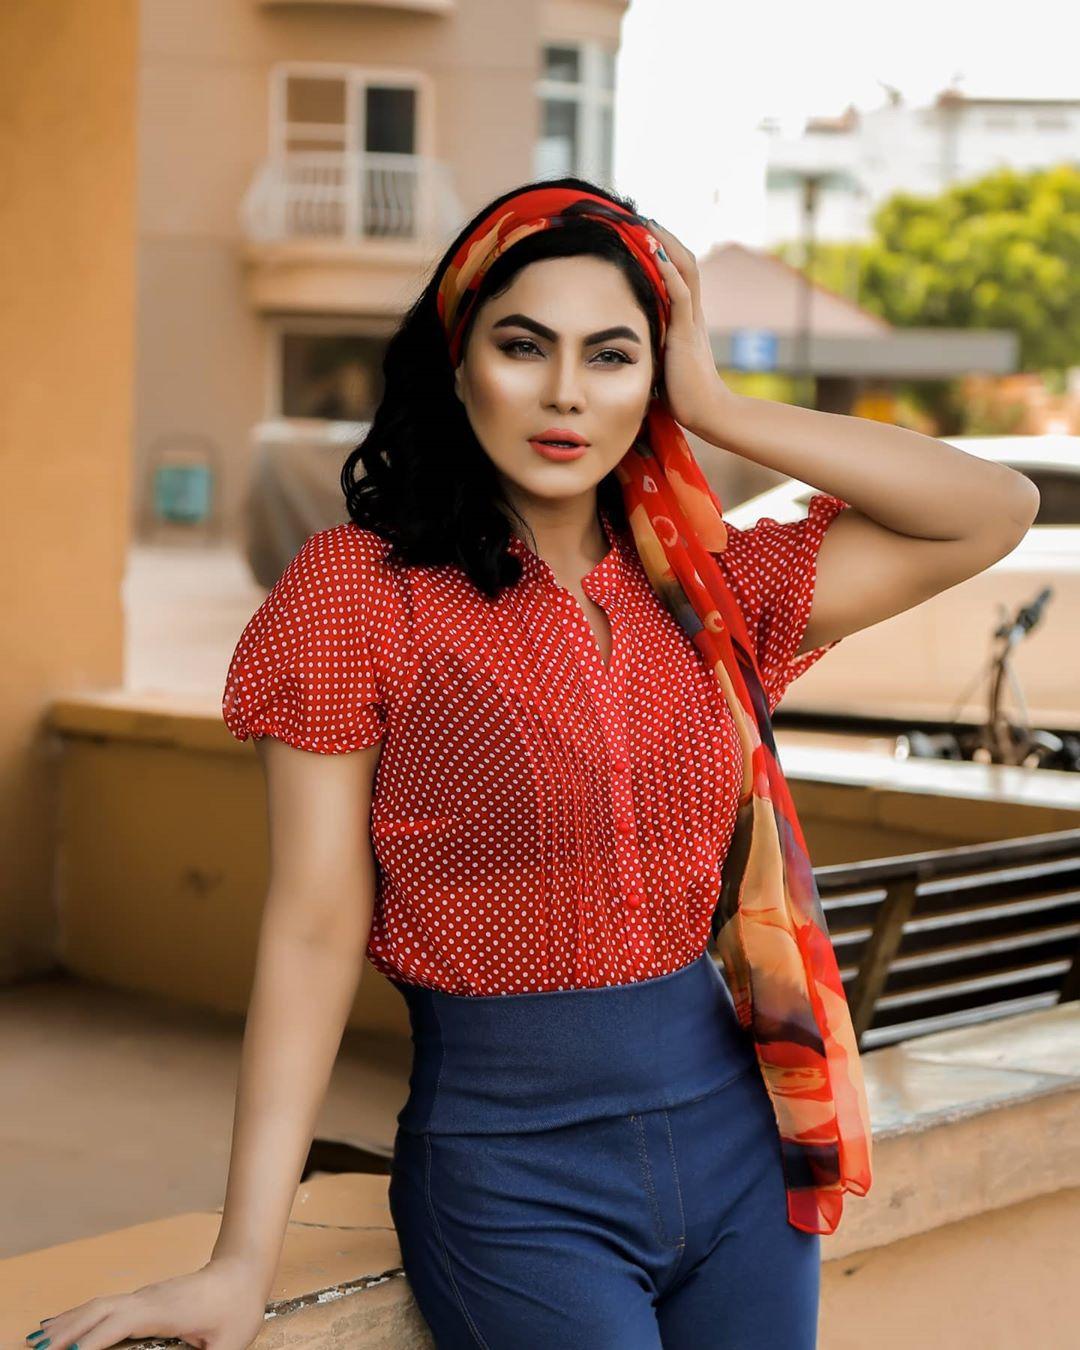 Actress Veena Malik Latest Pictures from Instagram